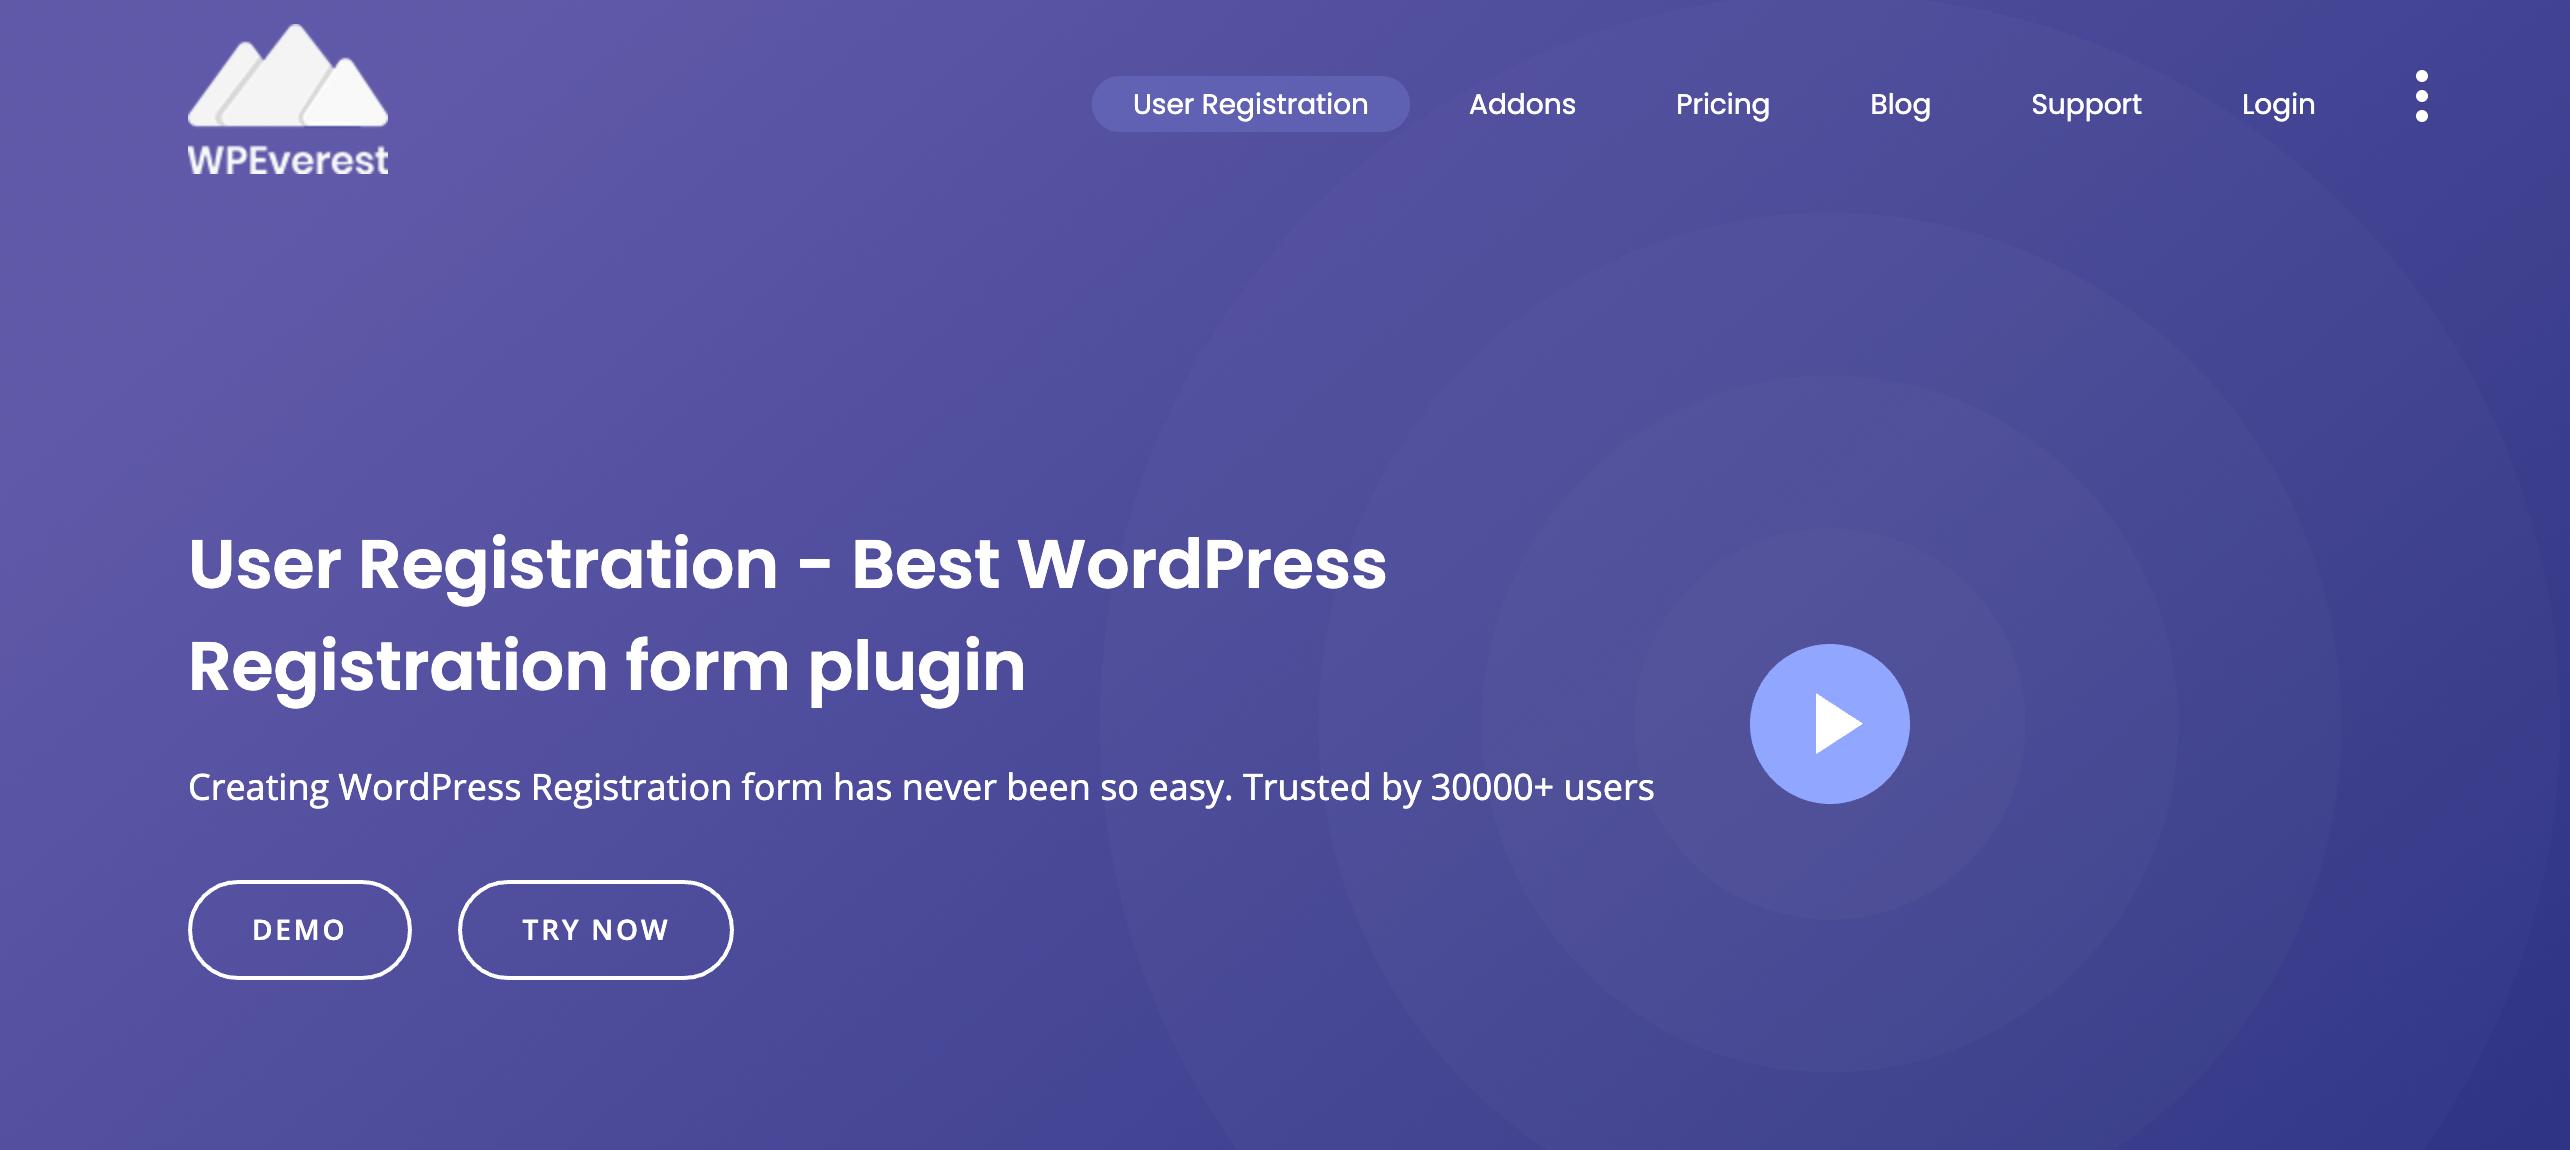 User Registration - WordPress Registration form plugin